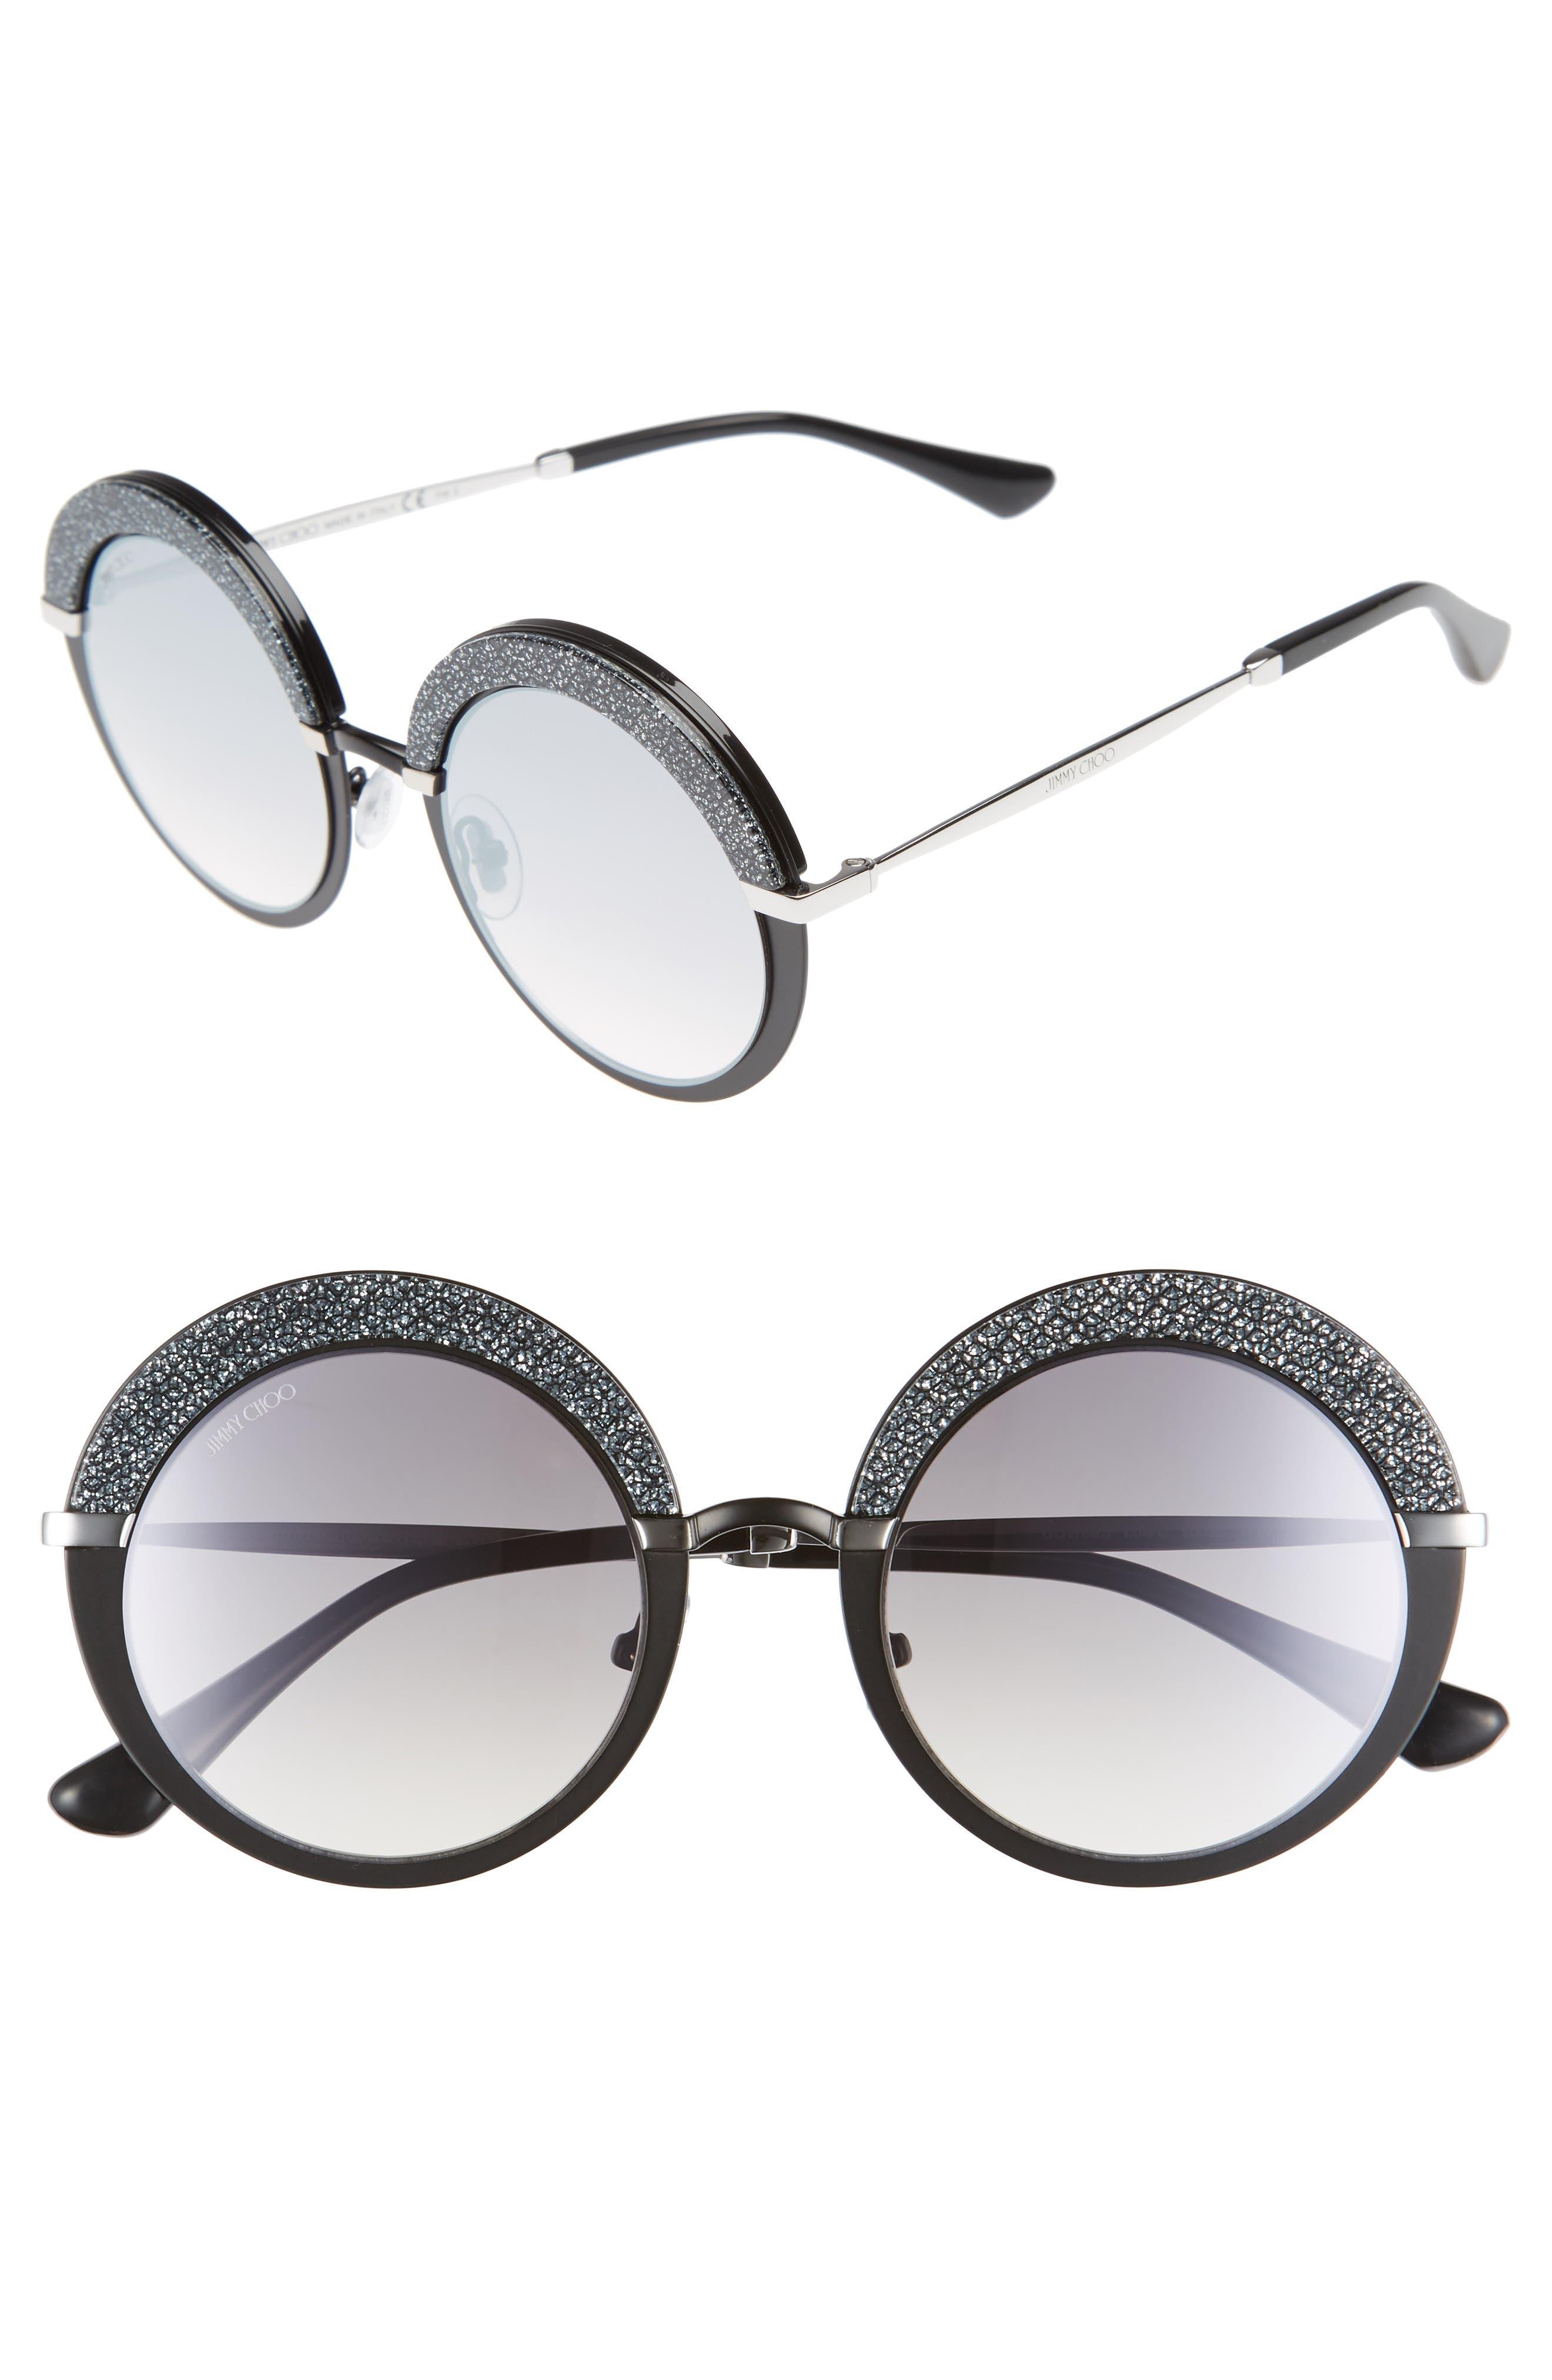 Gotha/S 50mm Round Sunglasses,                         Main,                         color, Matte Black/ Palladium